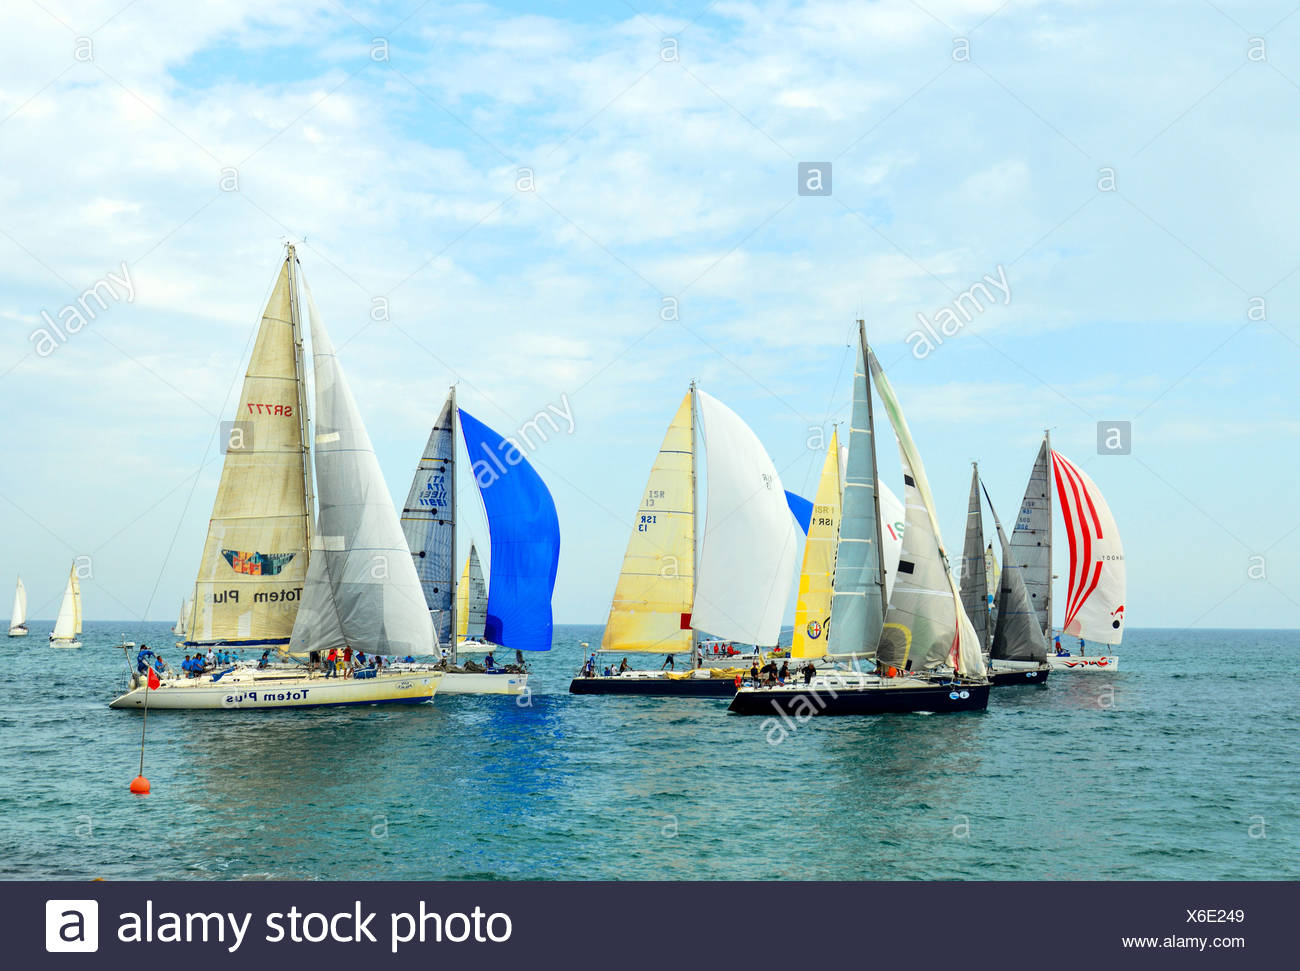 Sailboats in the Mediterranean Sea - Stock Image